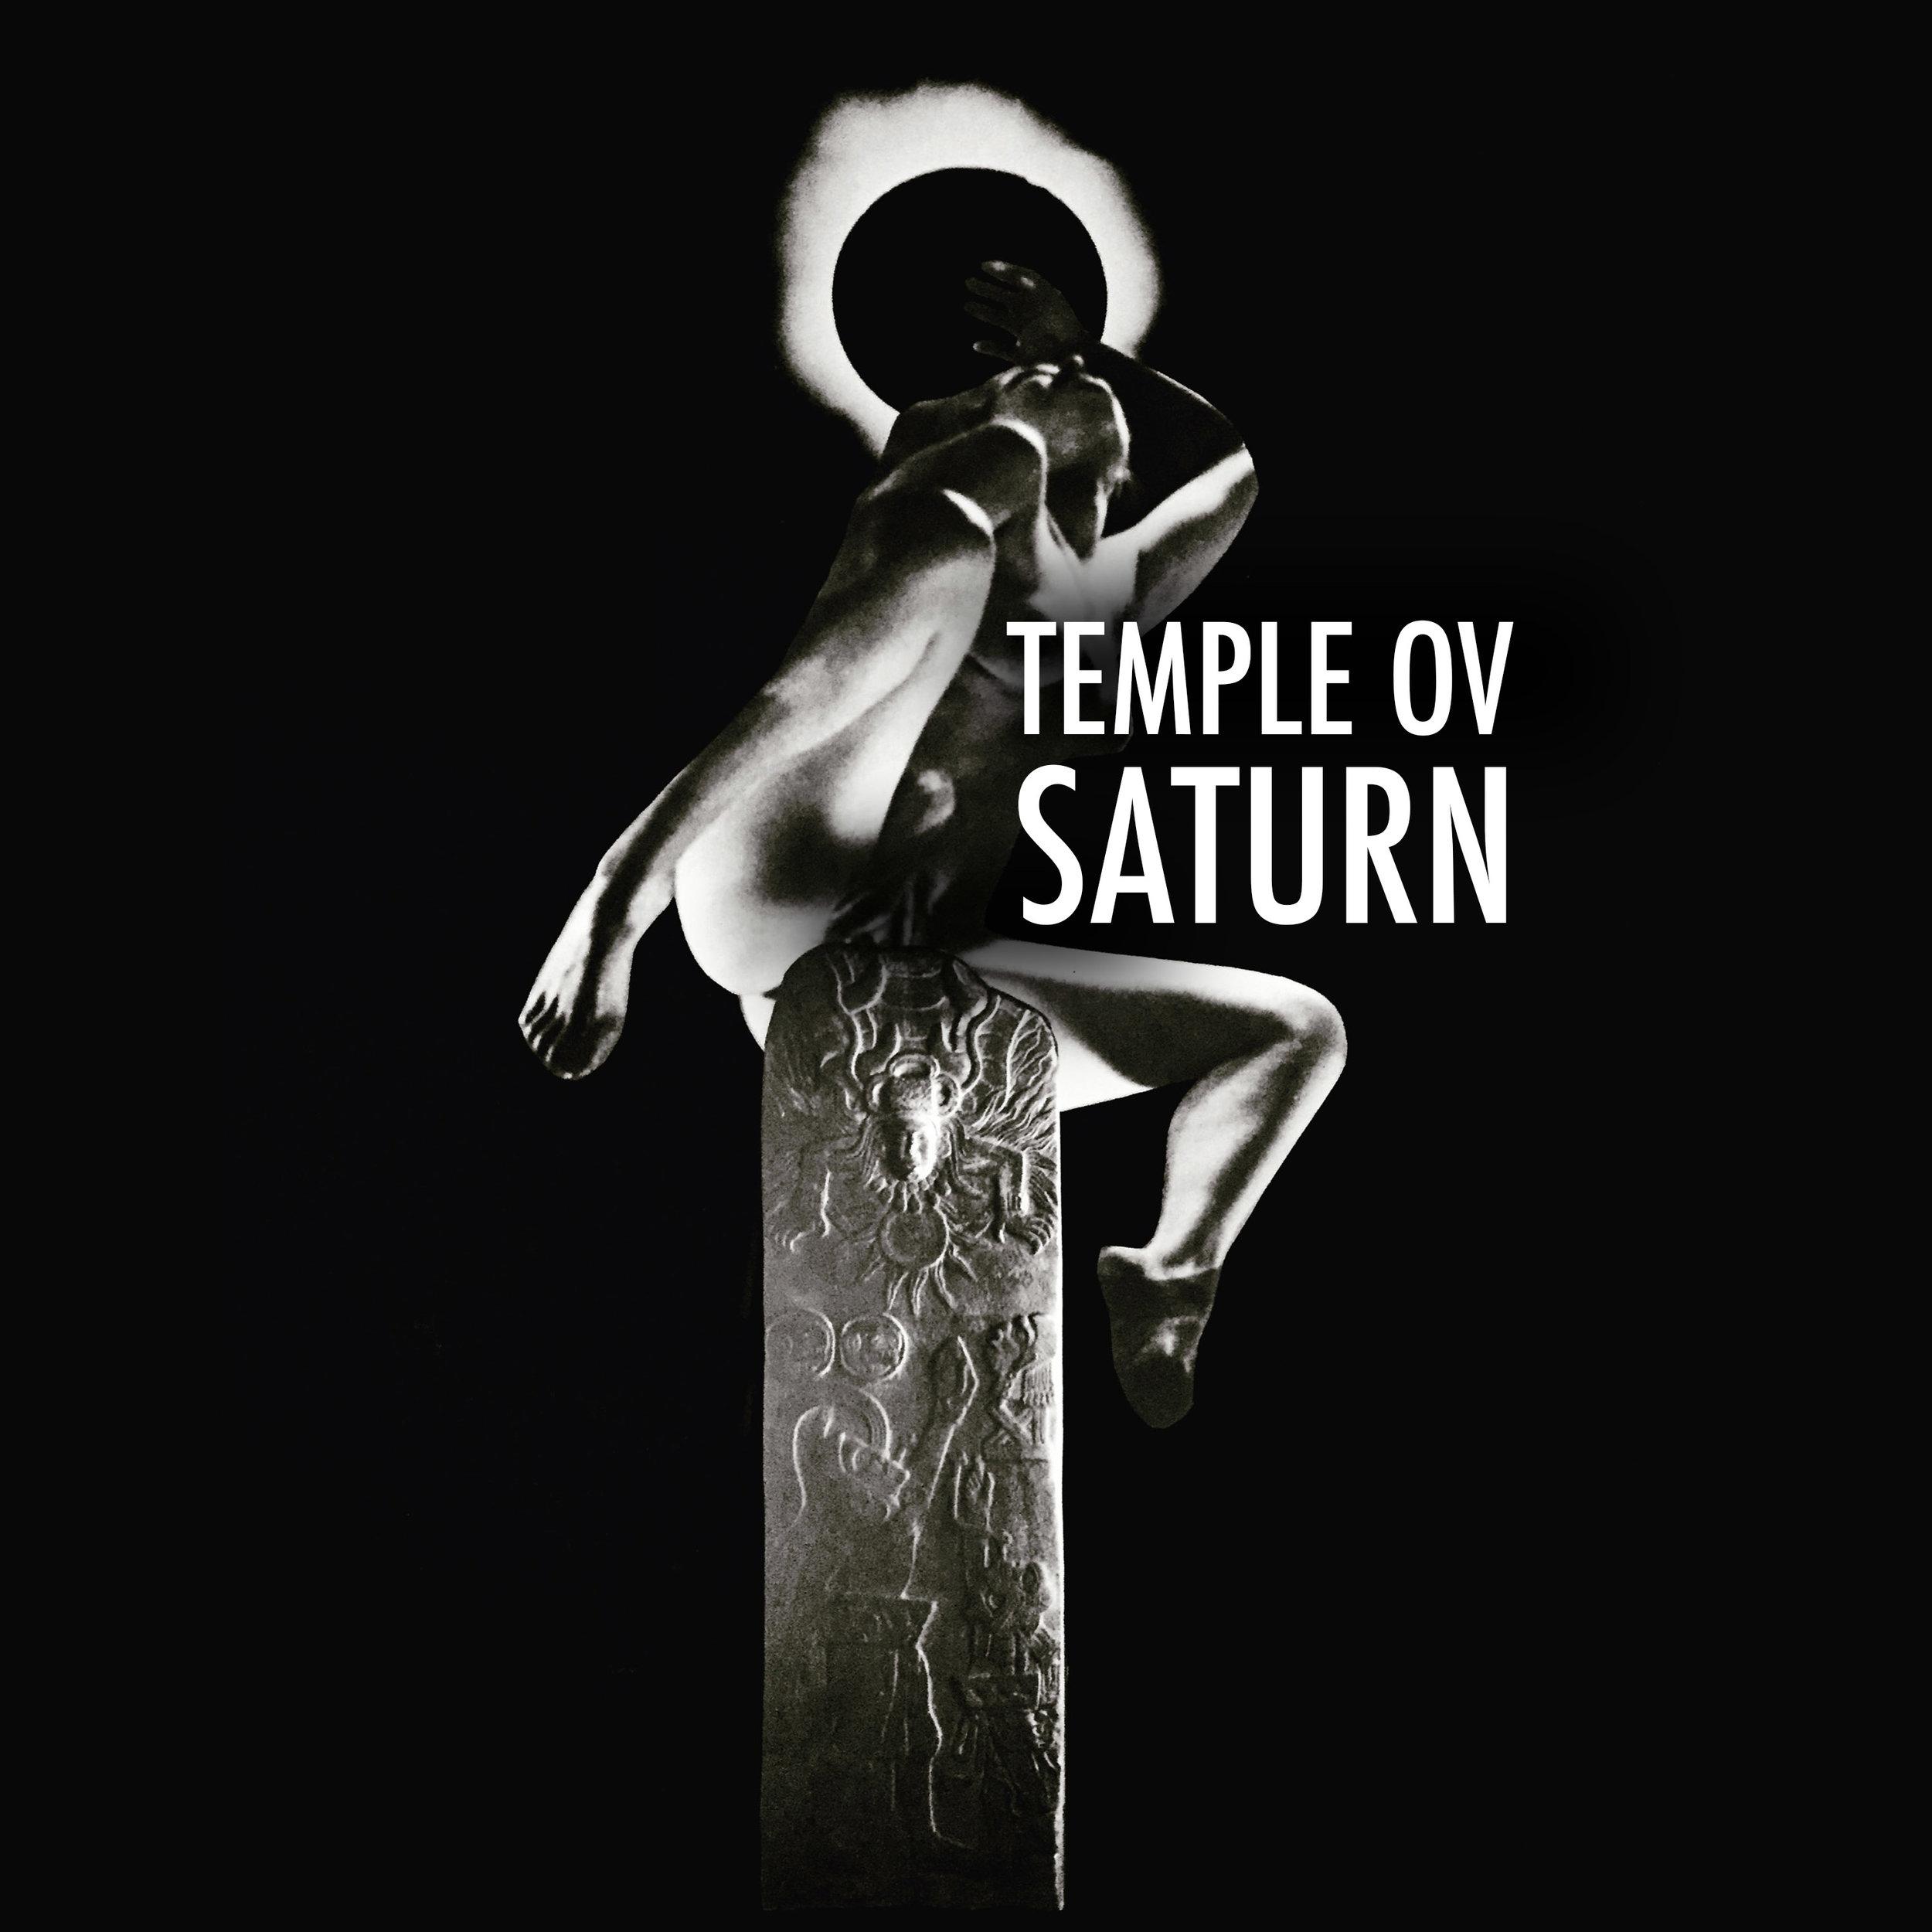 Temple ov Saturn - Bride of the Sun, Daughter of the Stars